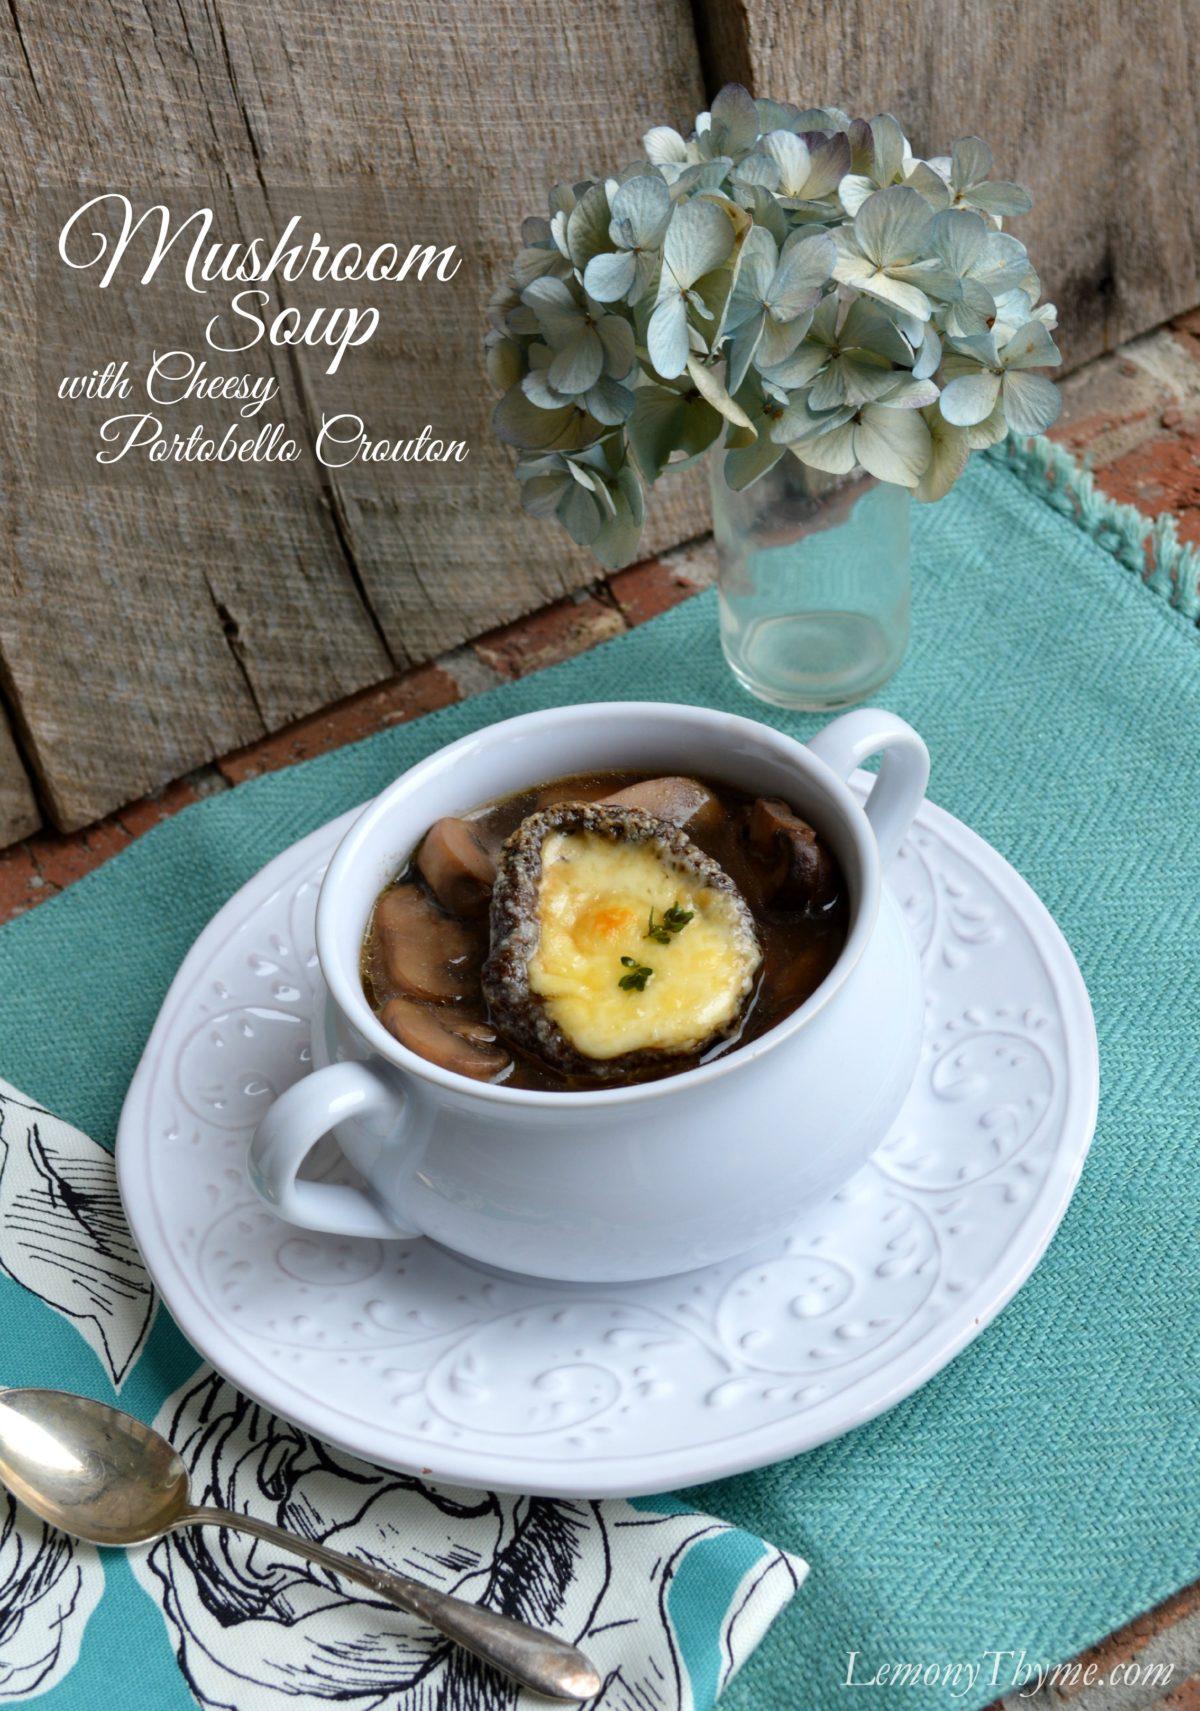 Mushroom Soup with Cheesy Portobella Crouton | LemonyThyme.com | #ShareTheLove #SoupRecipes